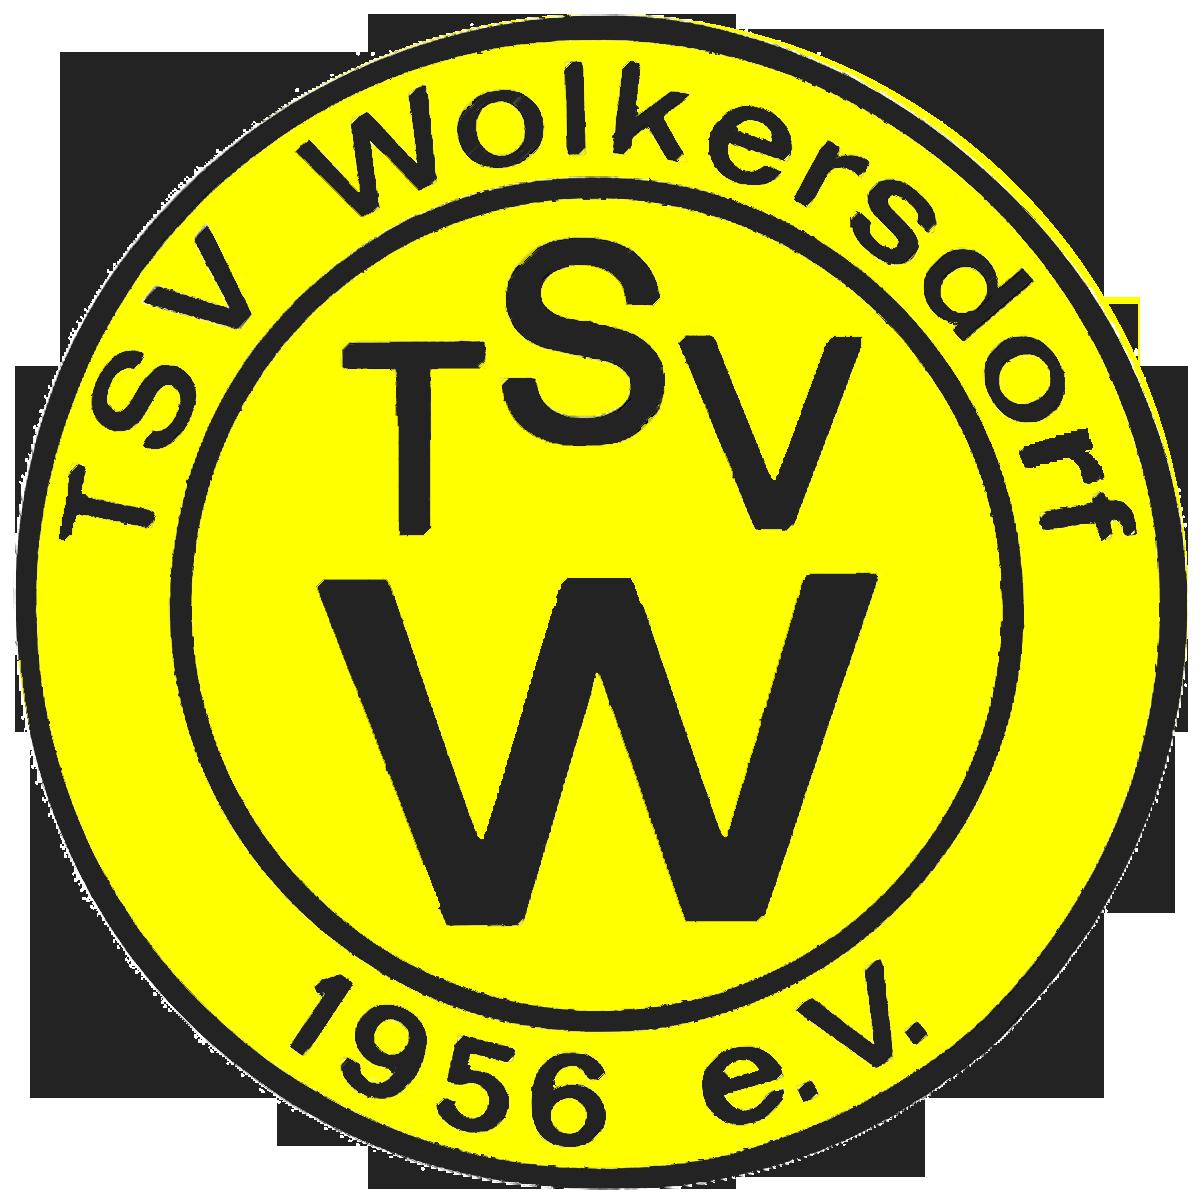 TSV Wolkersdorf 1956 e.V.